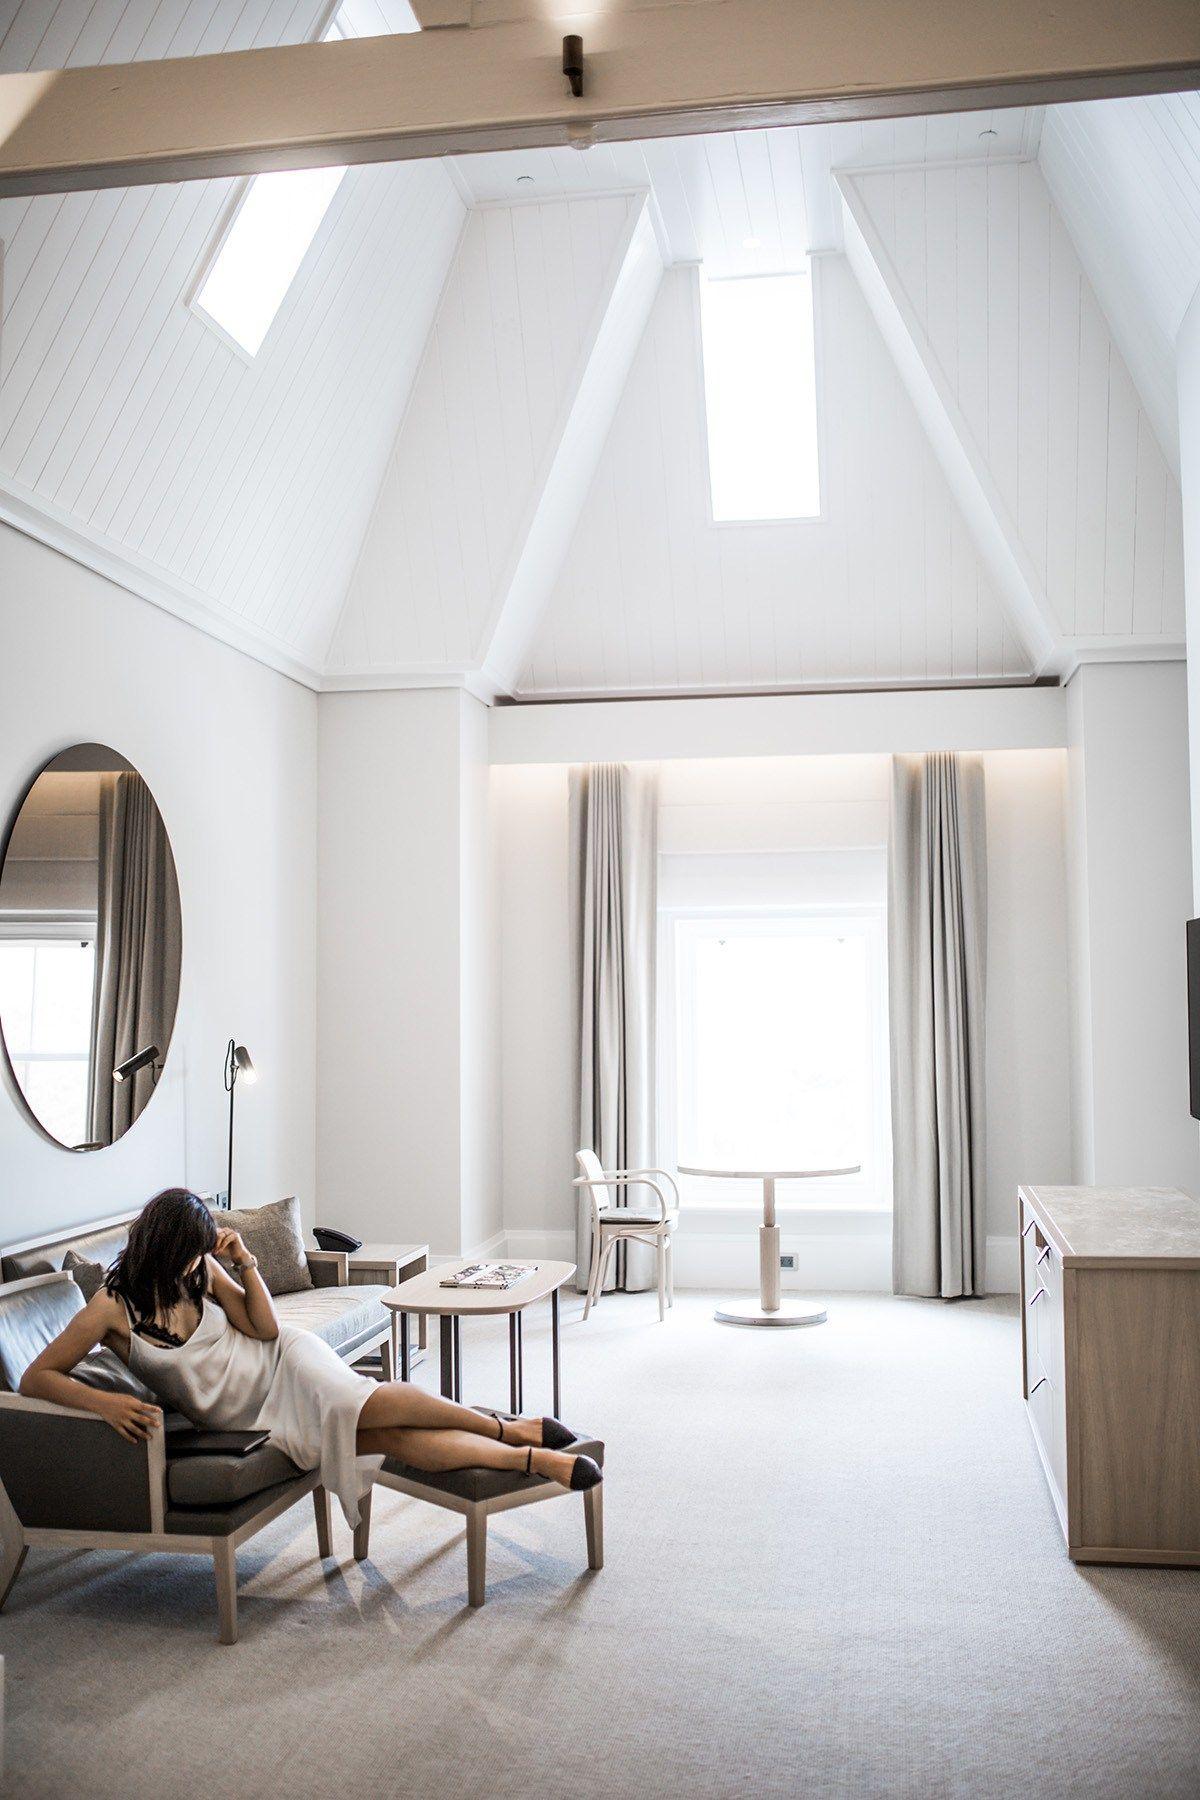 Luxury Hotel Bedrooms: Perth Luxury Hotel - Como The Treasury